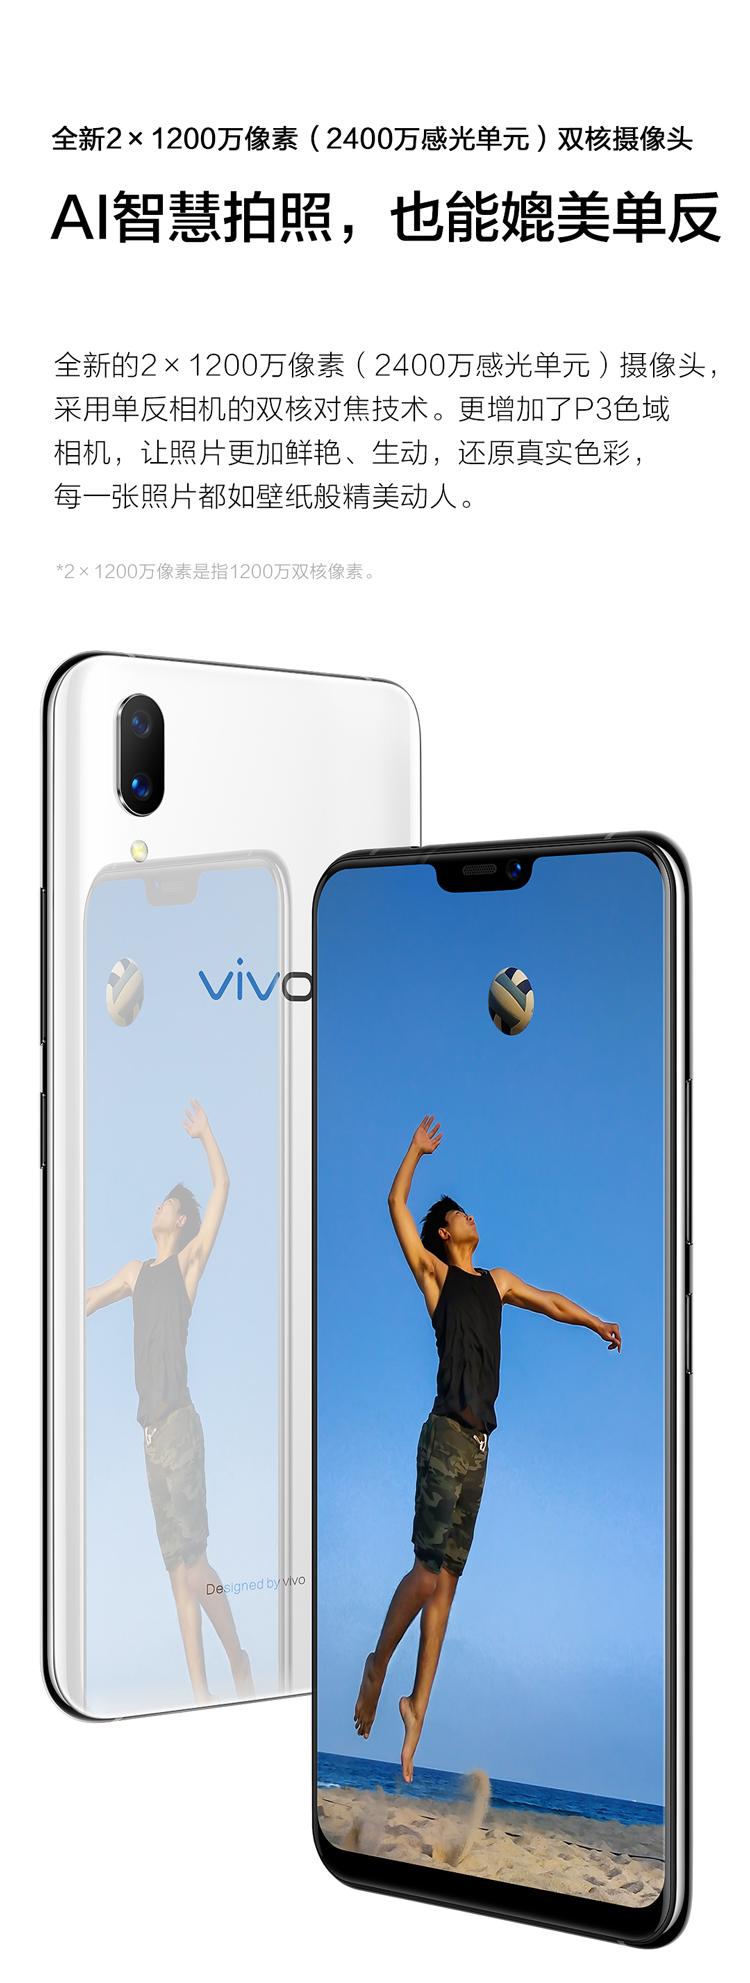 vivo X21 屏幕指纹版 双摄拍照游戏手机 6GB+128GB 全网通4G